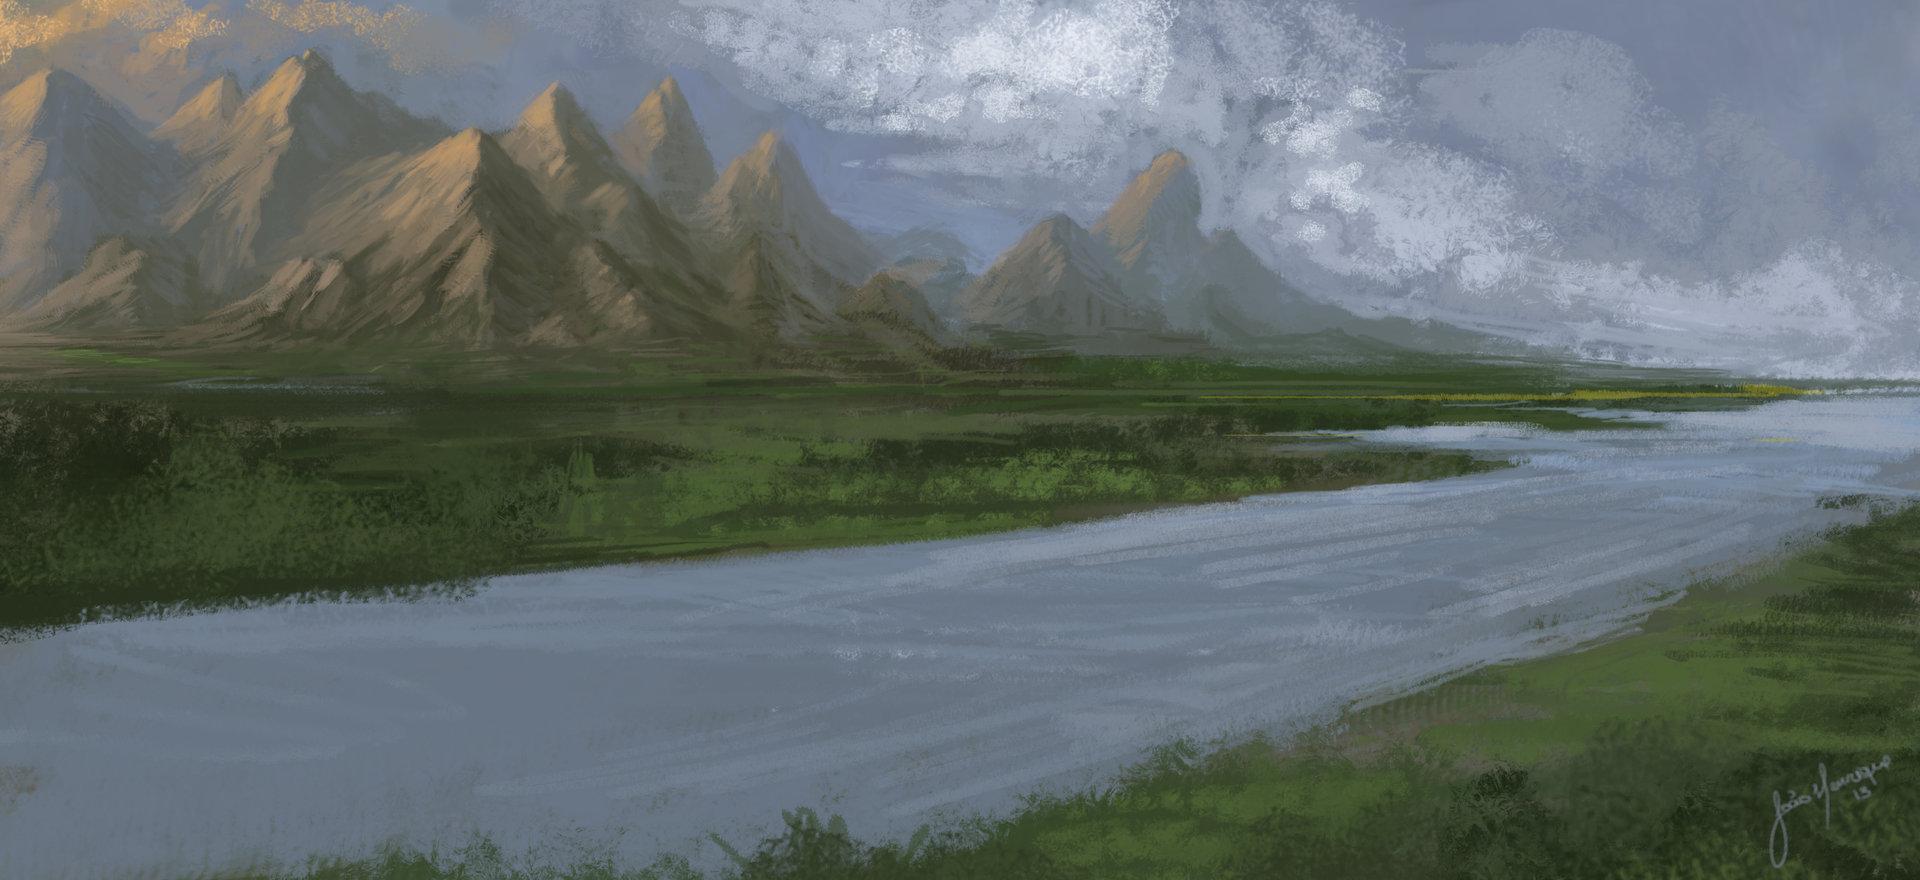 Joao henrique pacheco paisagem 2 copia